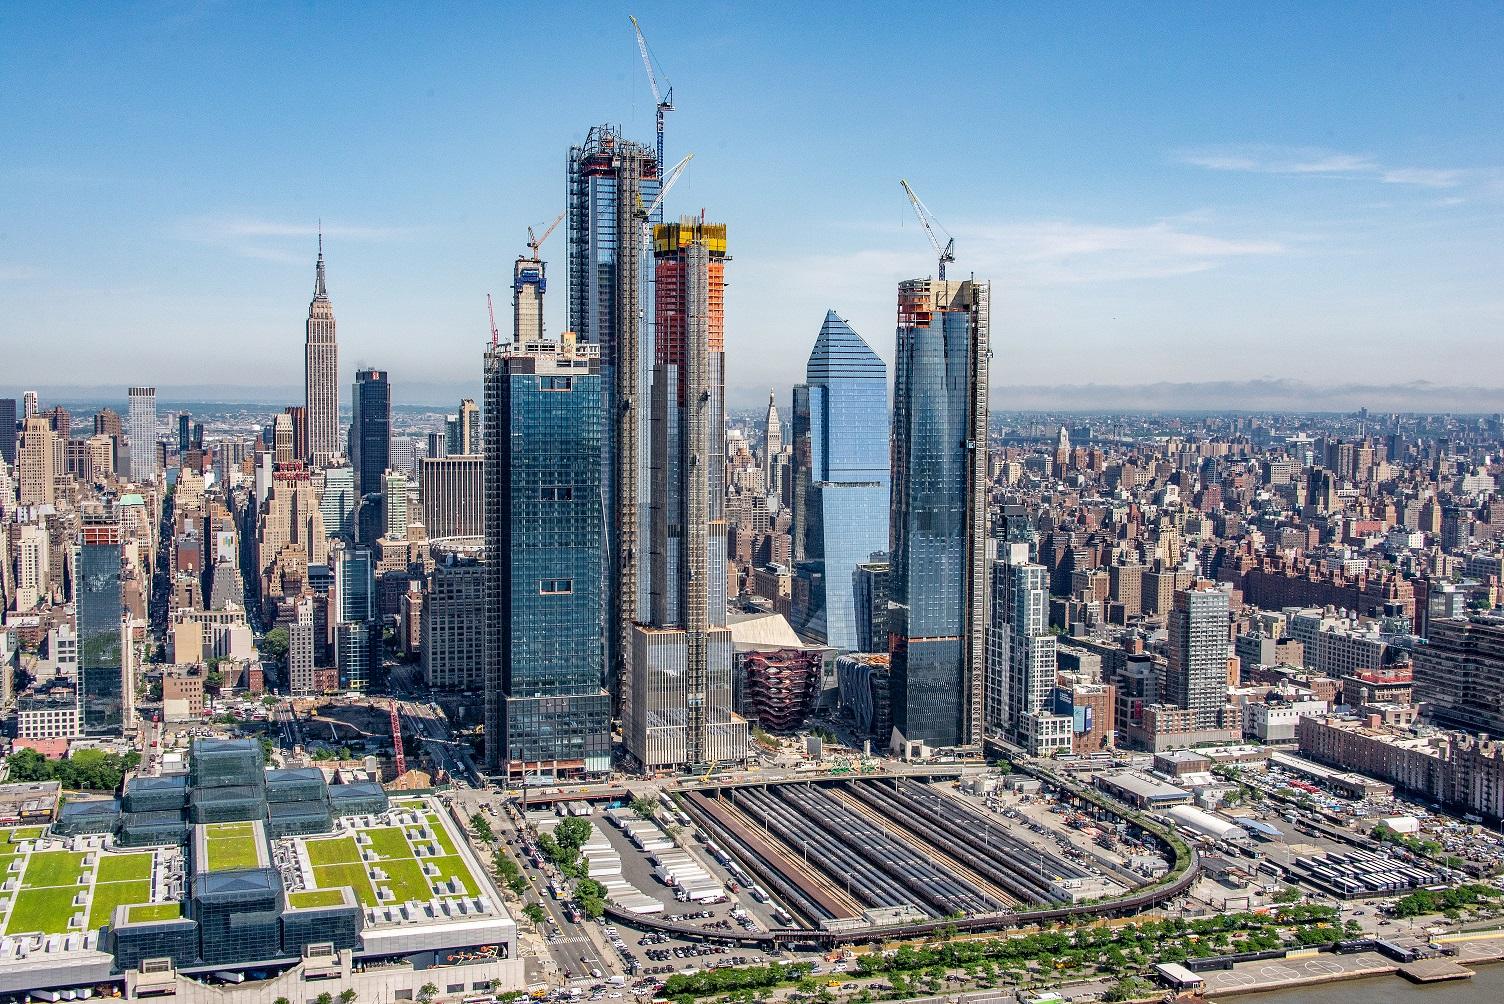 New York Developers To Build Suburban Style Mall In The: Das Nächste Mega-Projekt: Thyssenkrupp-Technologie Macht